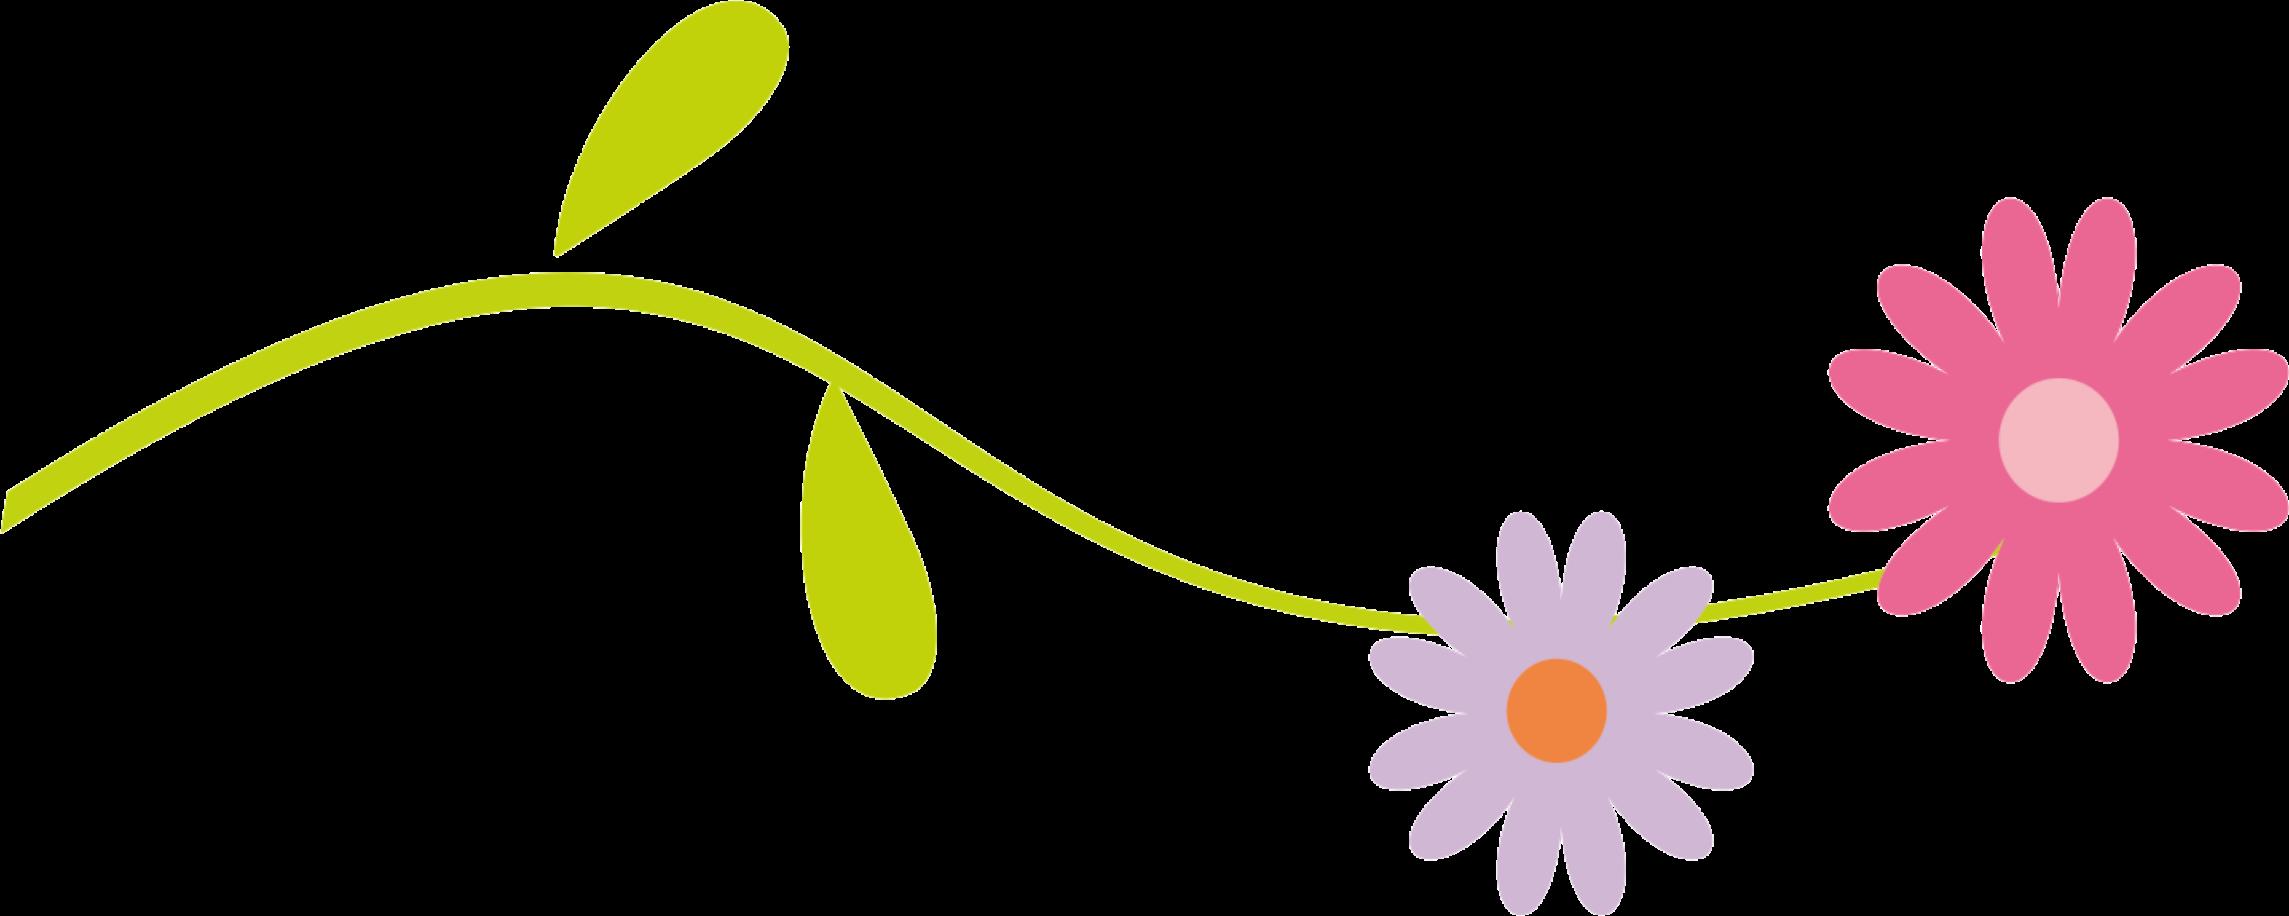 Floral Divider Clipart - Clip Art Flowers Line - Png ...